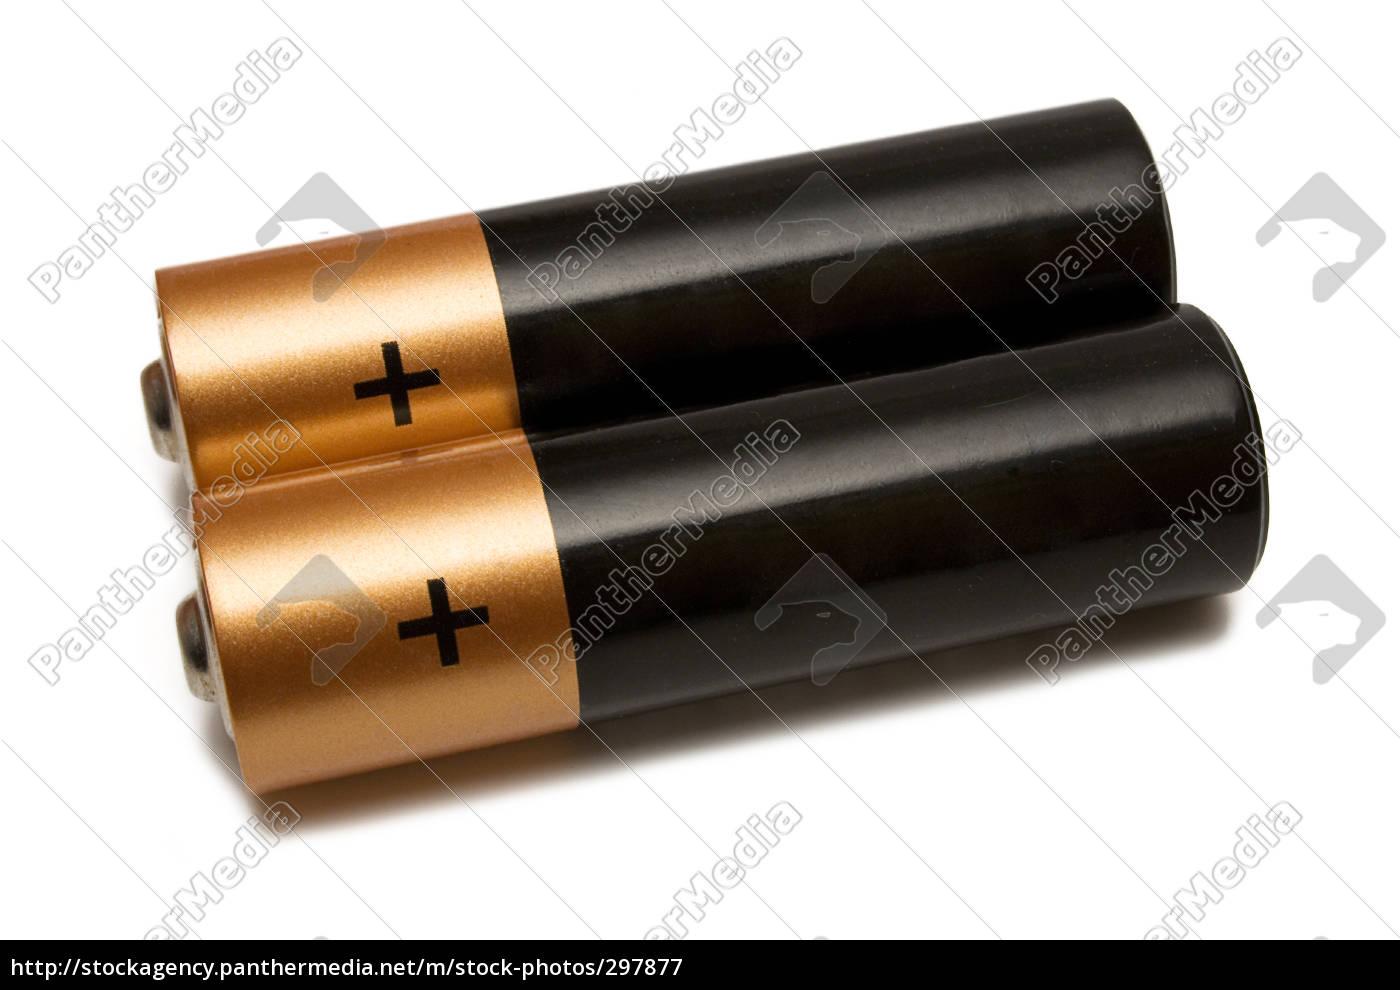 batteries - 297877